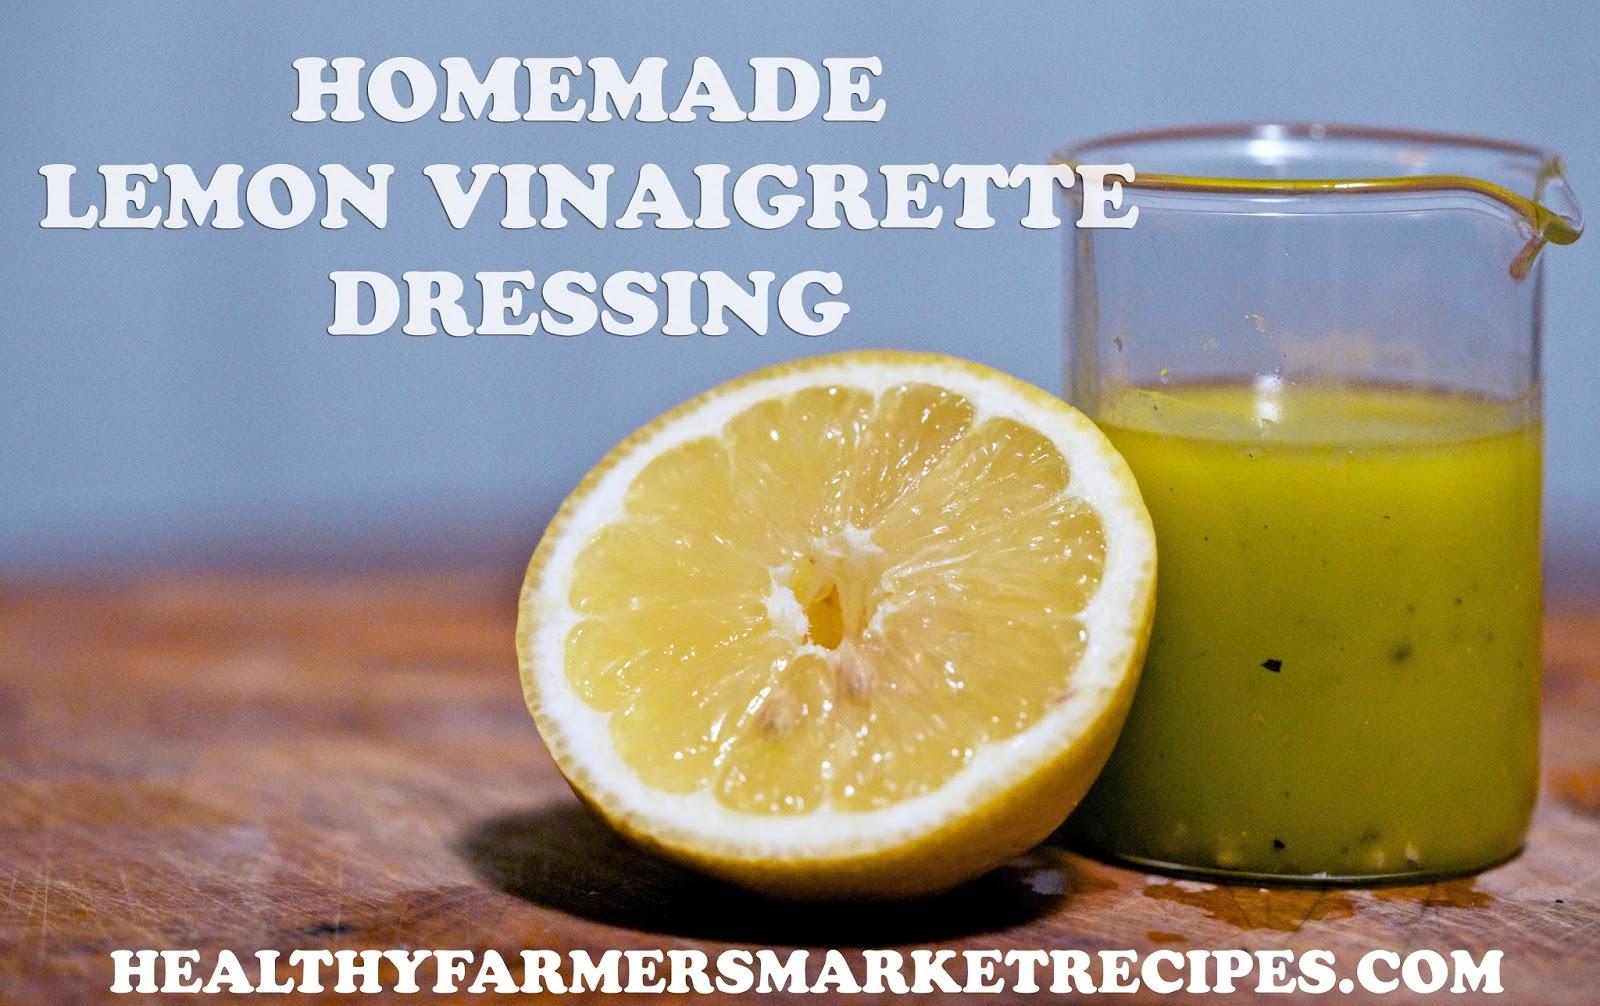 Healthy Farmer's Market Recipes: Lemon Vinaigrette Dressing Recipe